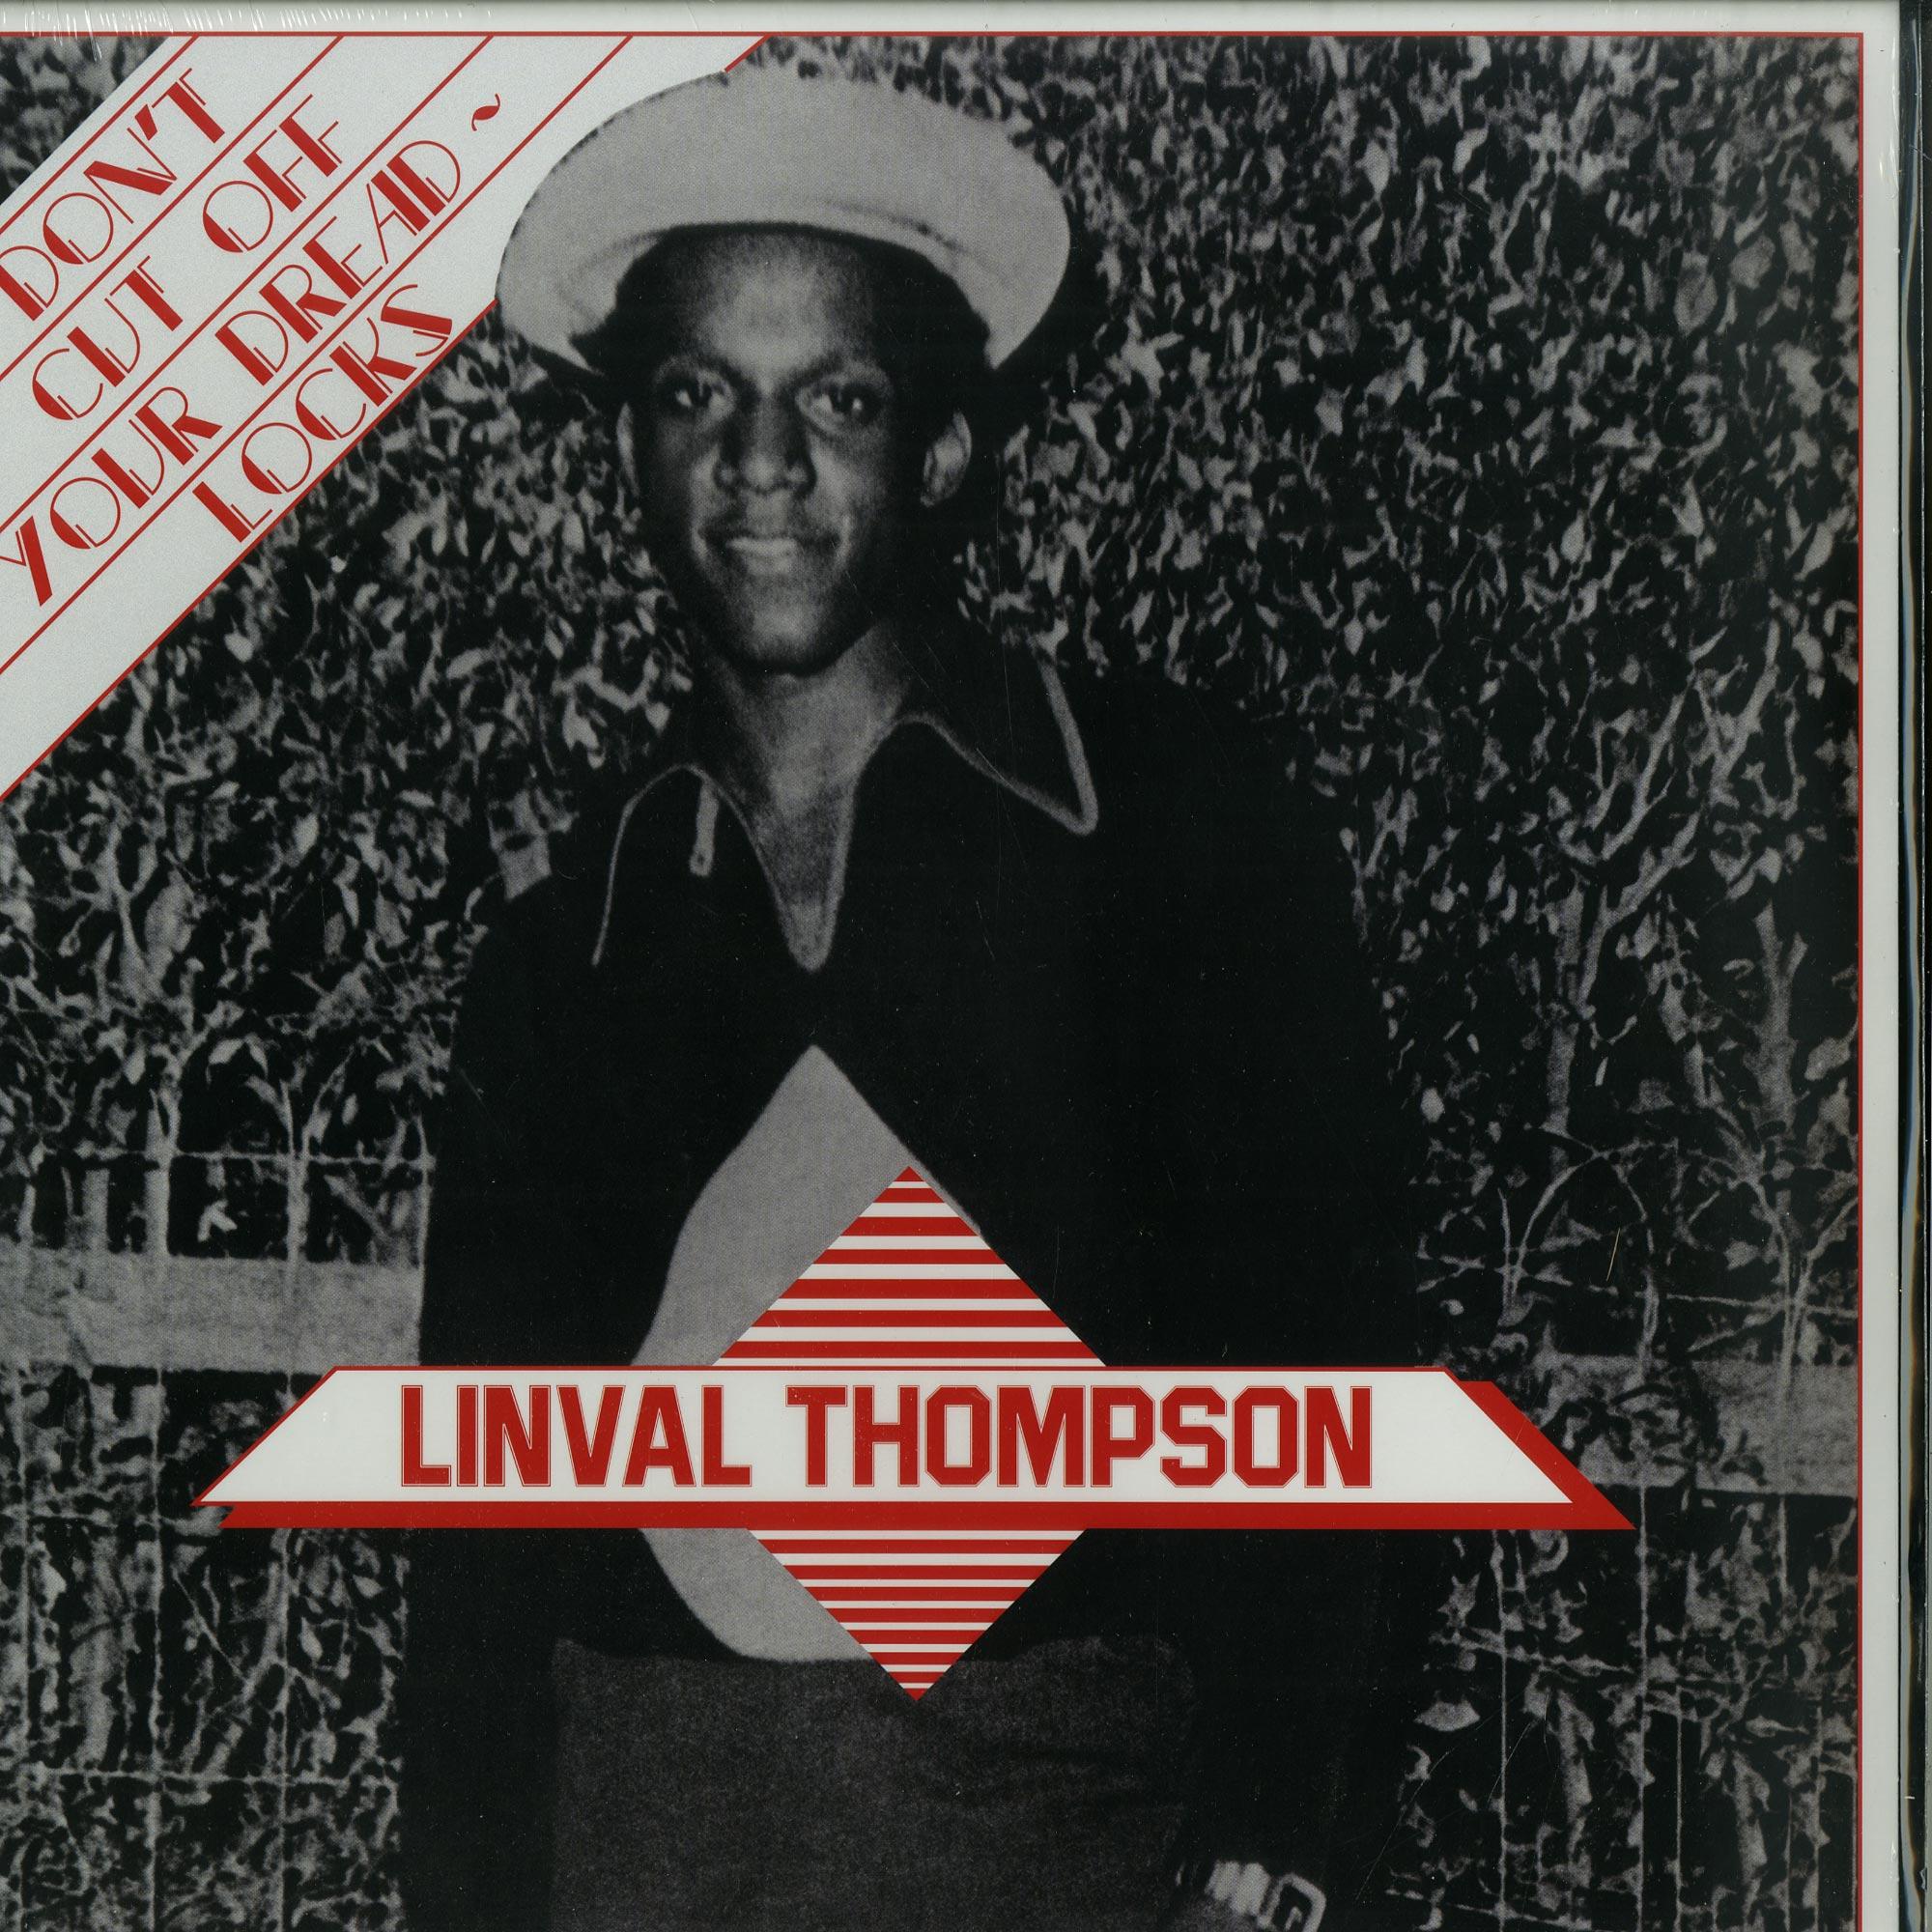 Linval Thompson - DONT CUT OFF YOUR DREADLOCKS